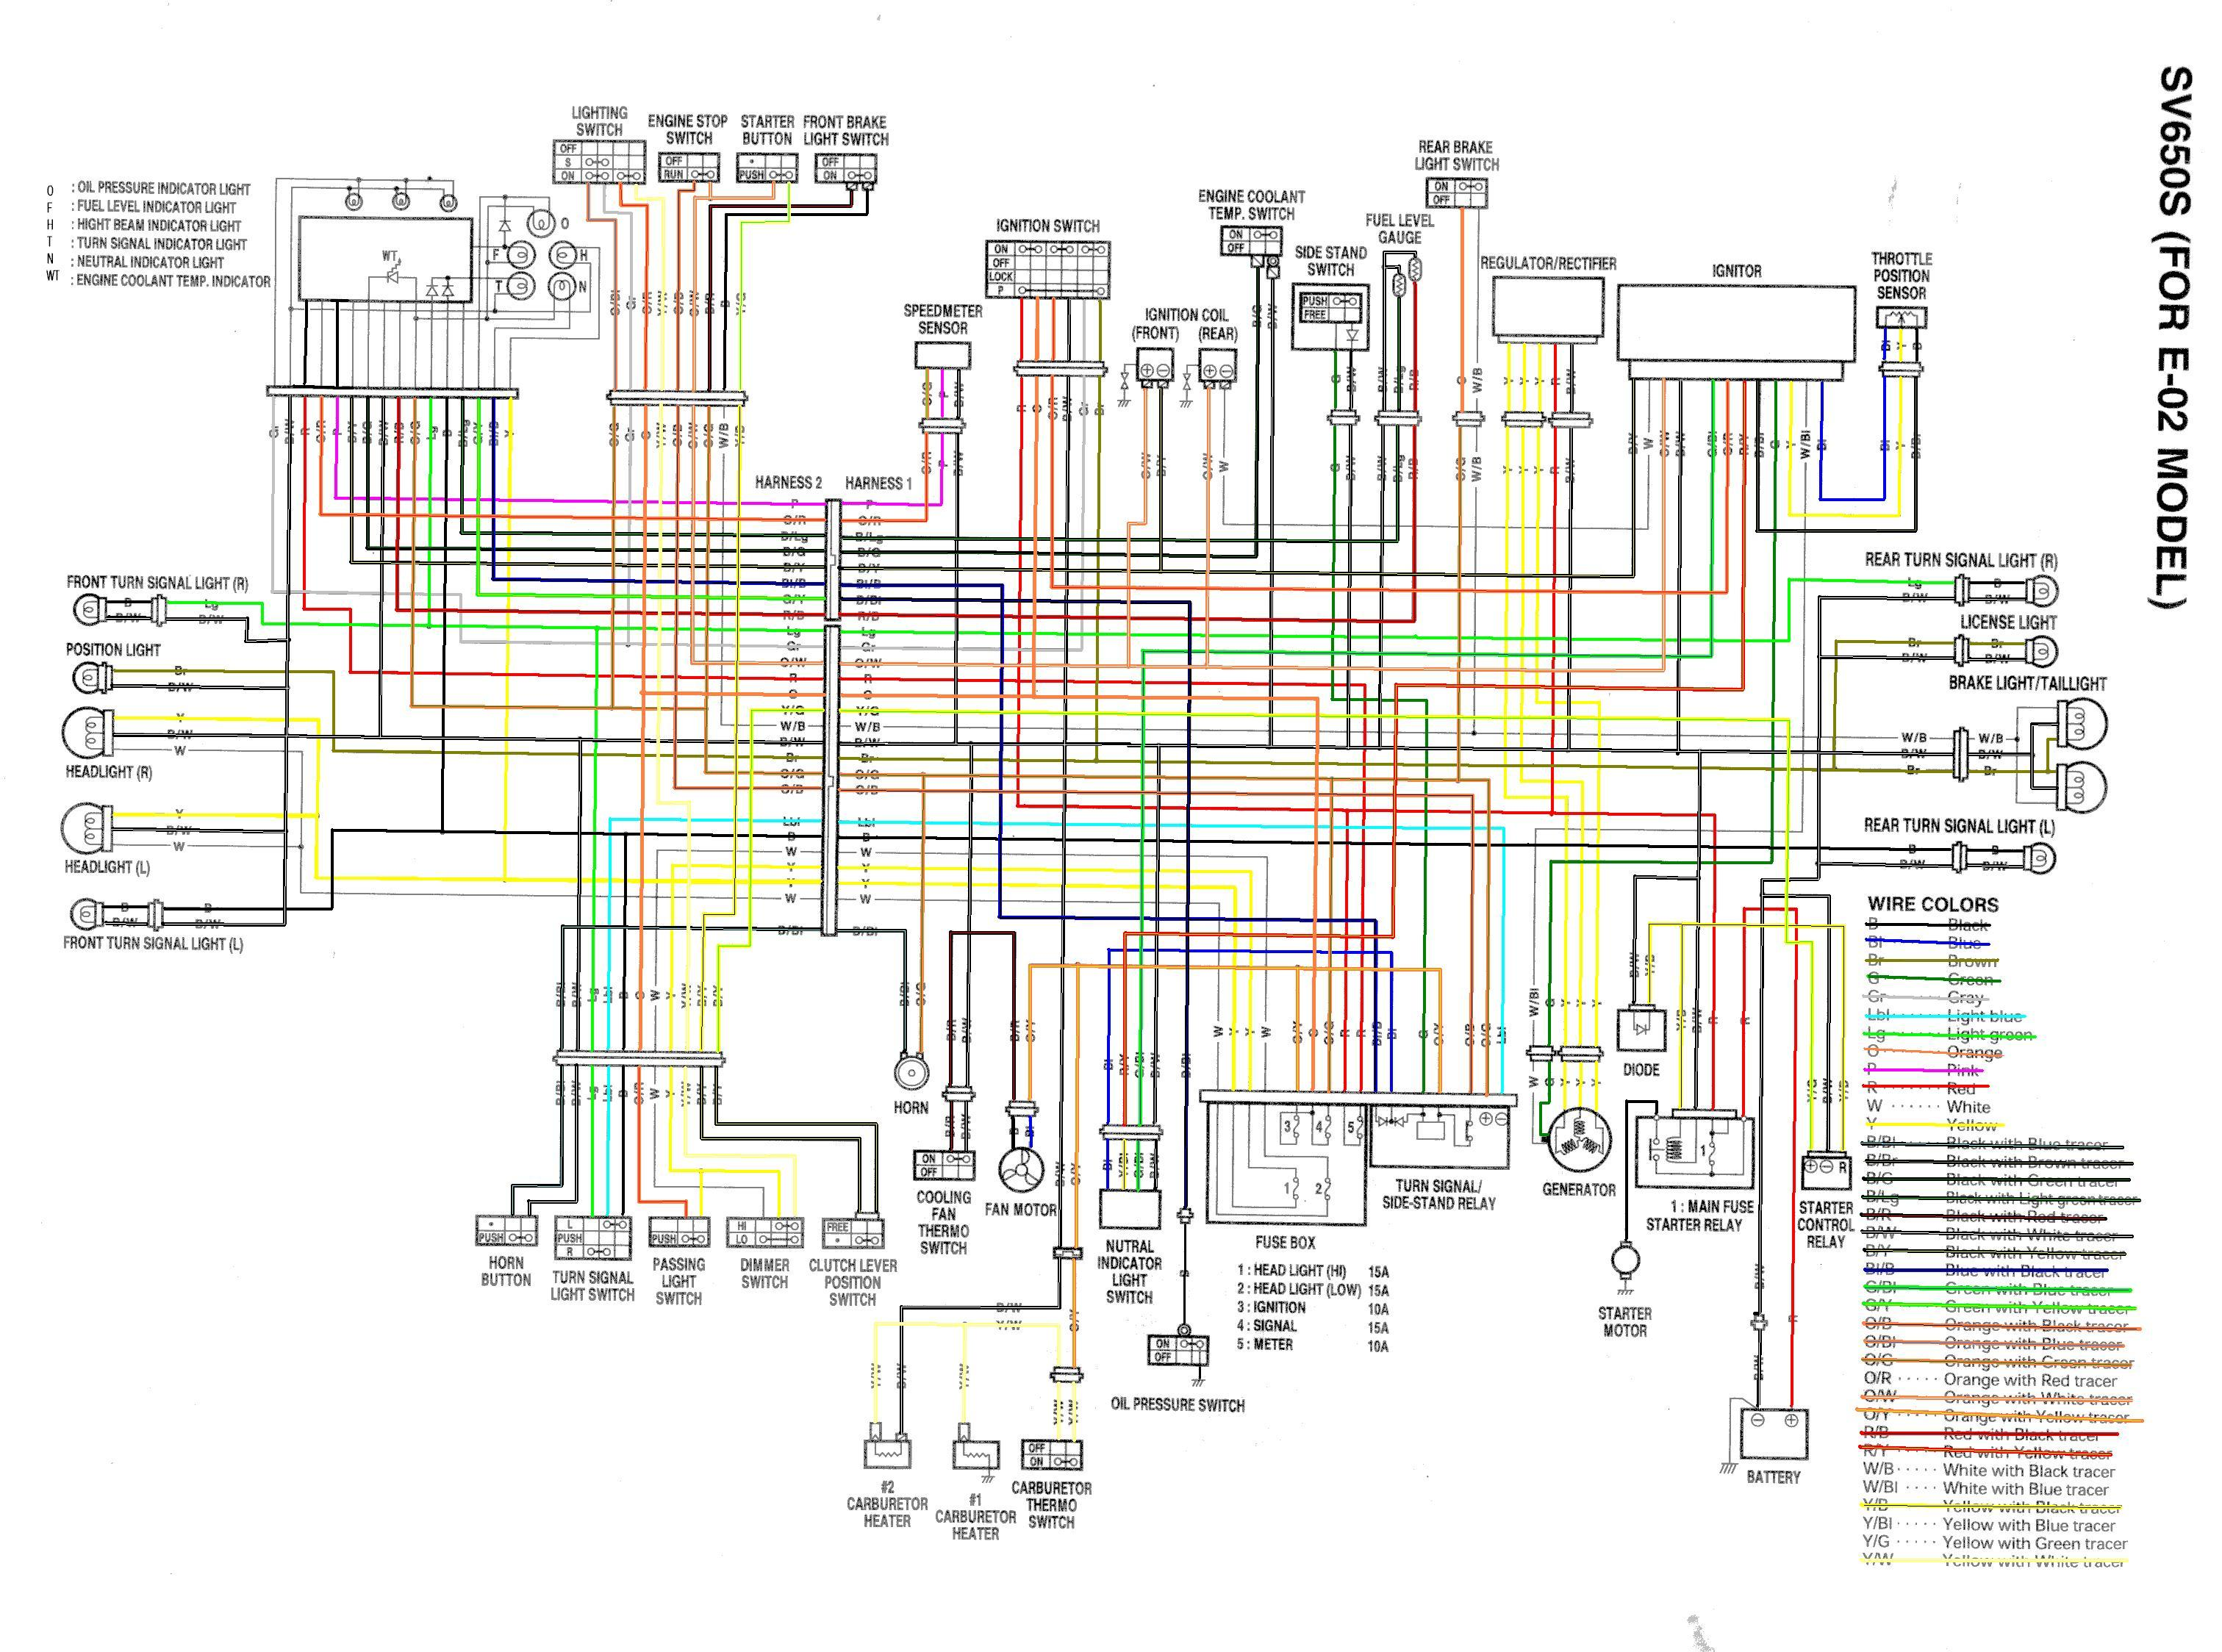 le_4845] 1st gen sv650 wiring diagram furthermore wiring diagram schematic  wiring  iness argu oliti strai icand jebrp getap throp aspi mohammedshrine librar  wiring 101